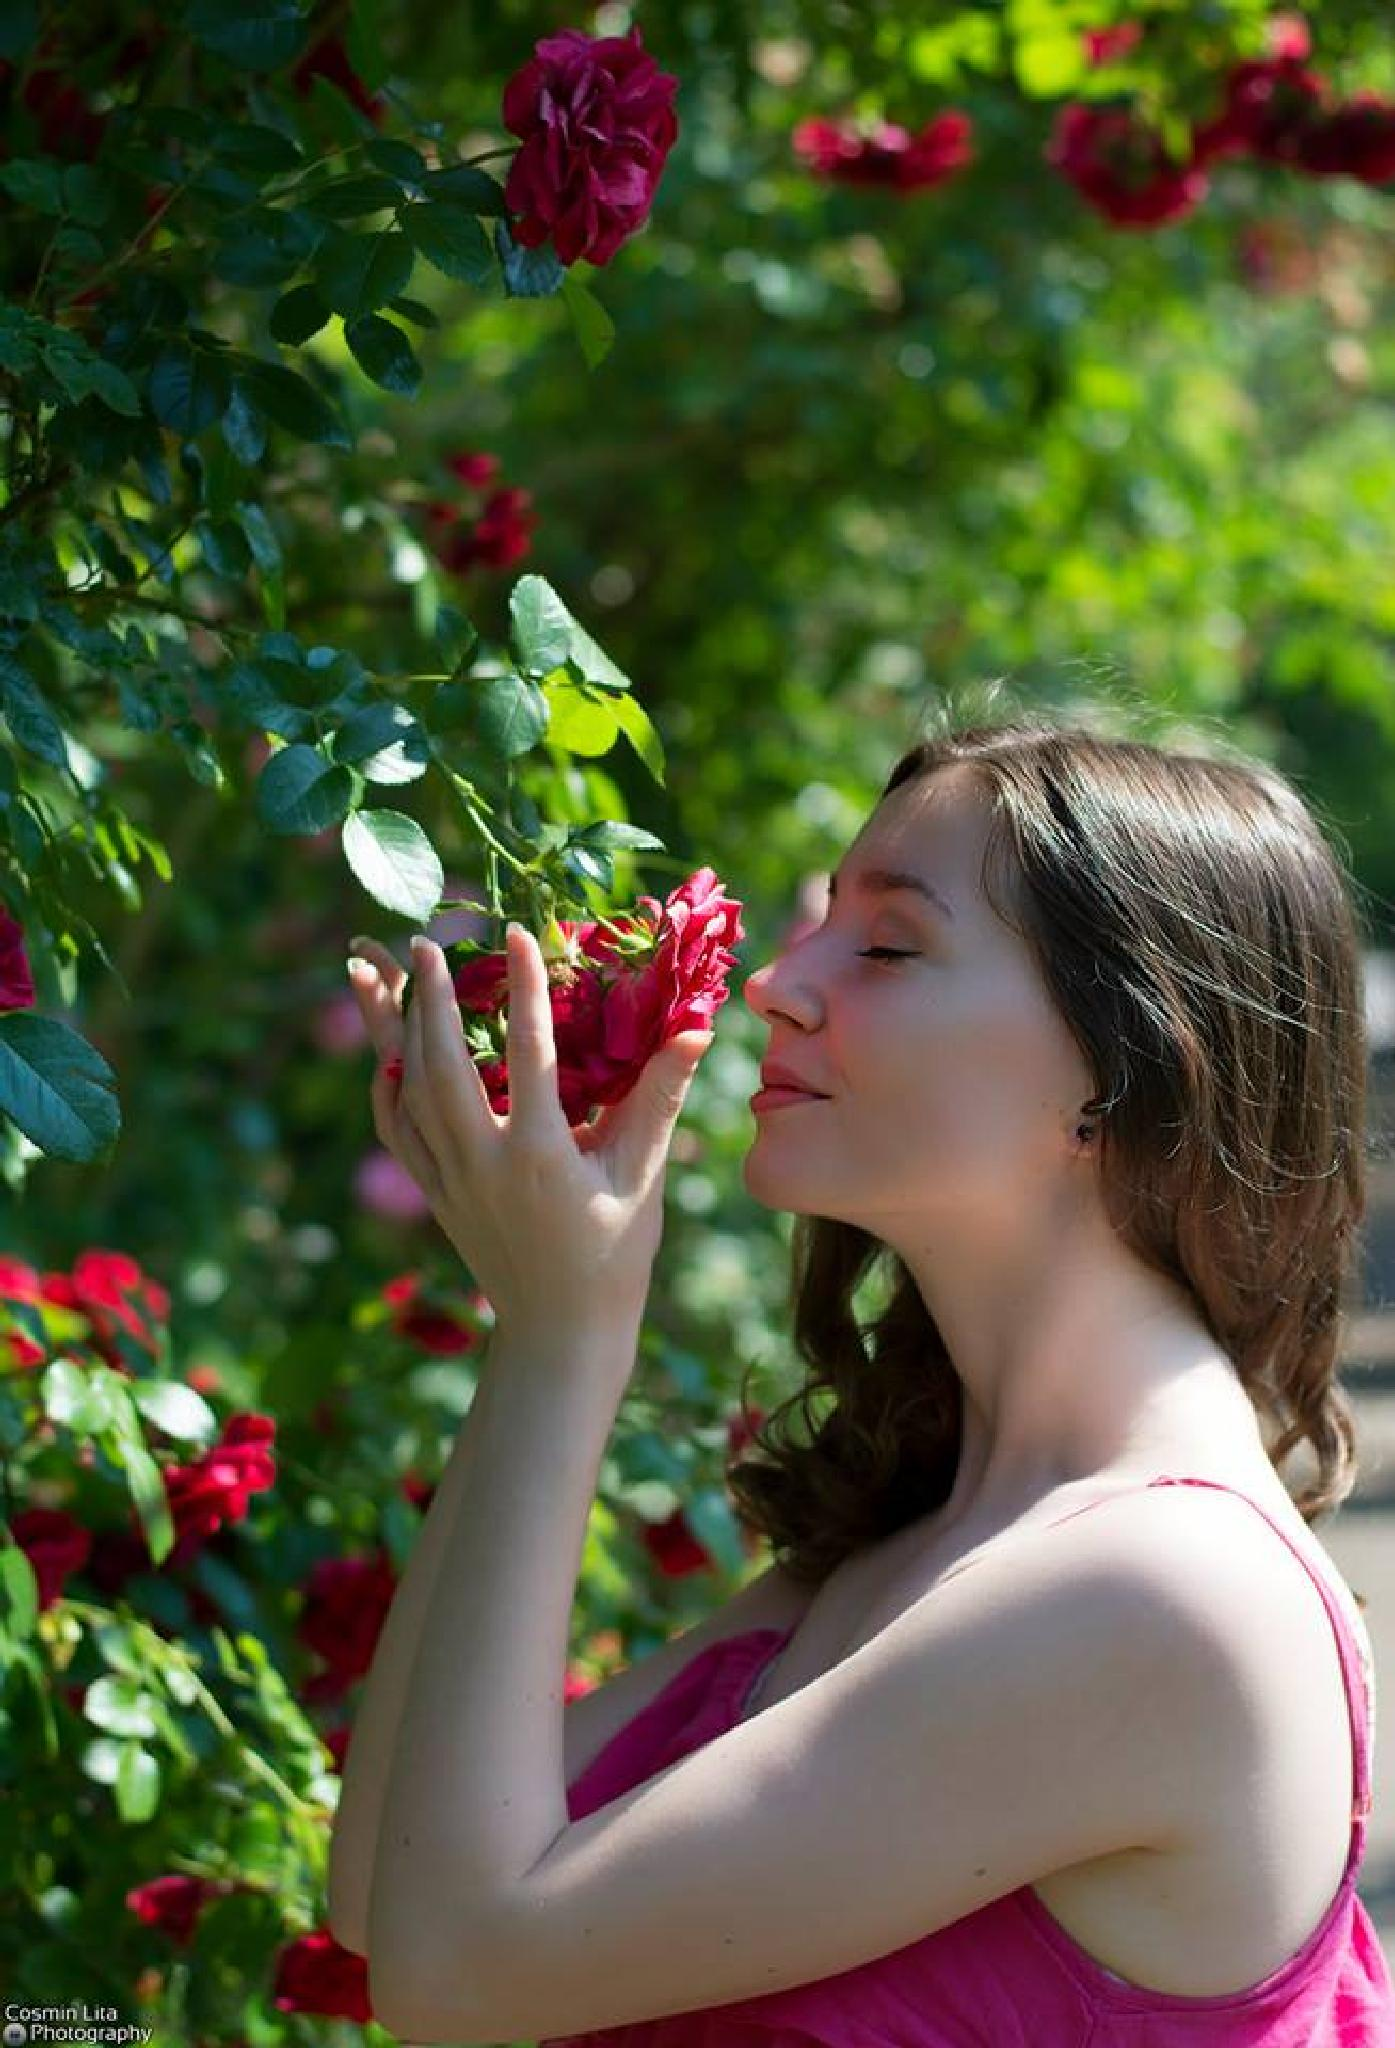 Rose Red by Cosmin Lita